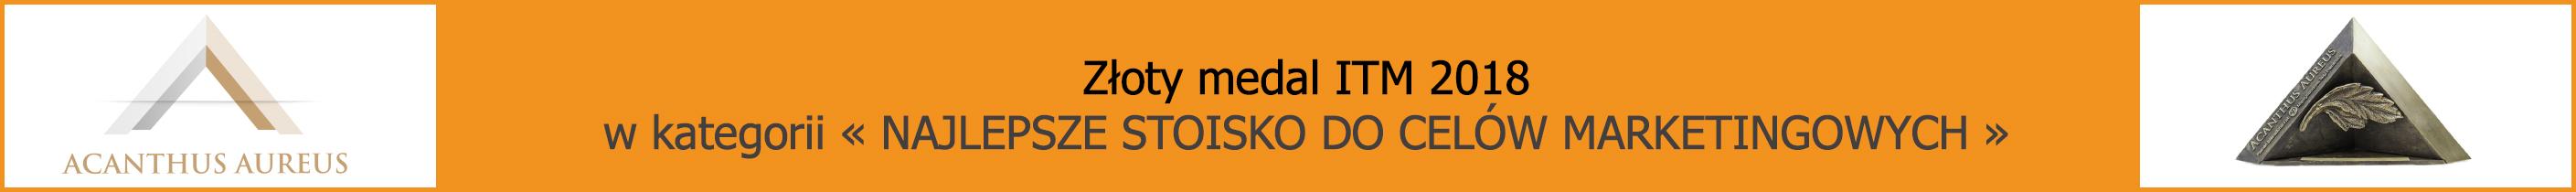 złoty medal ITM 2018